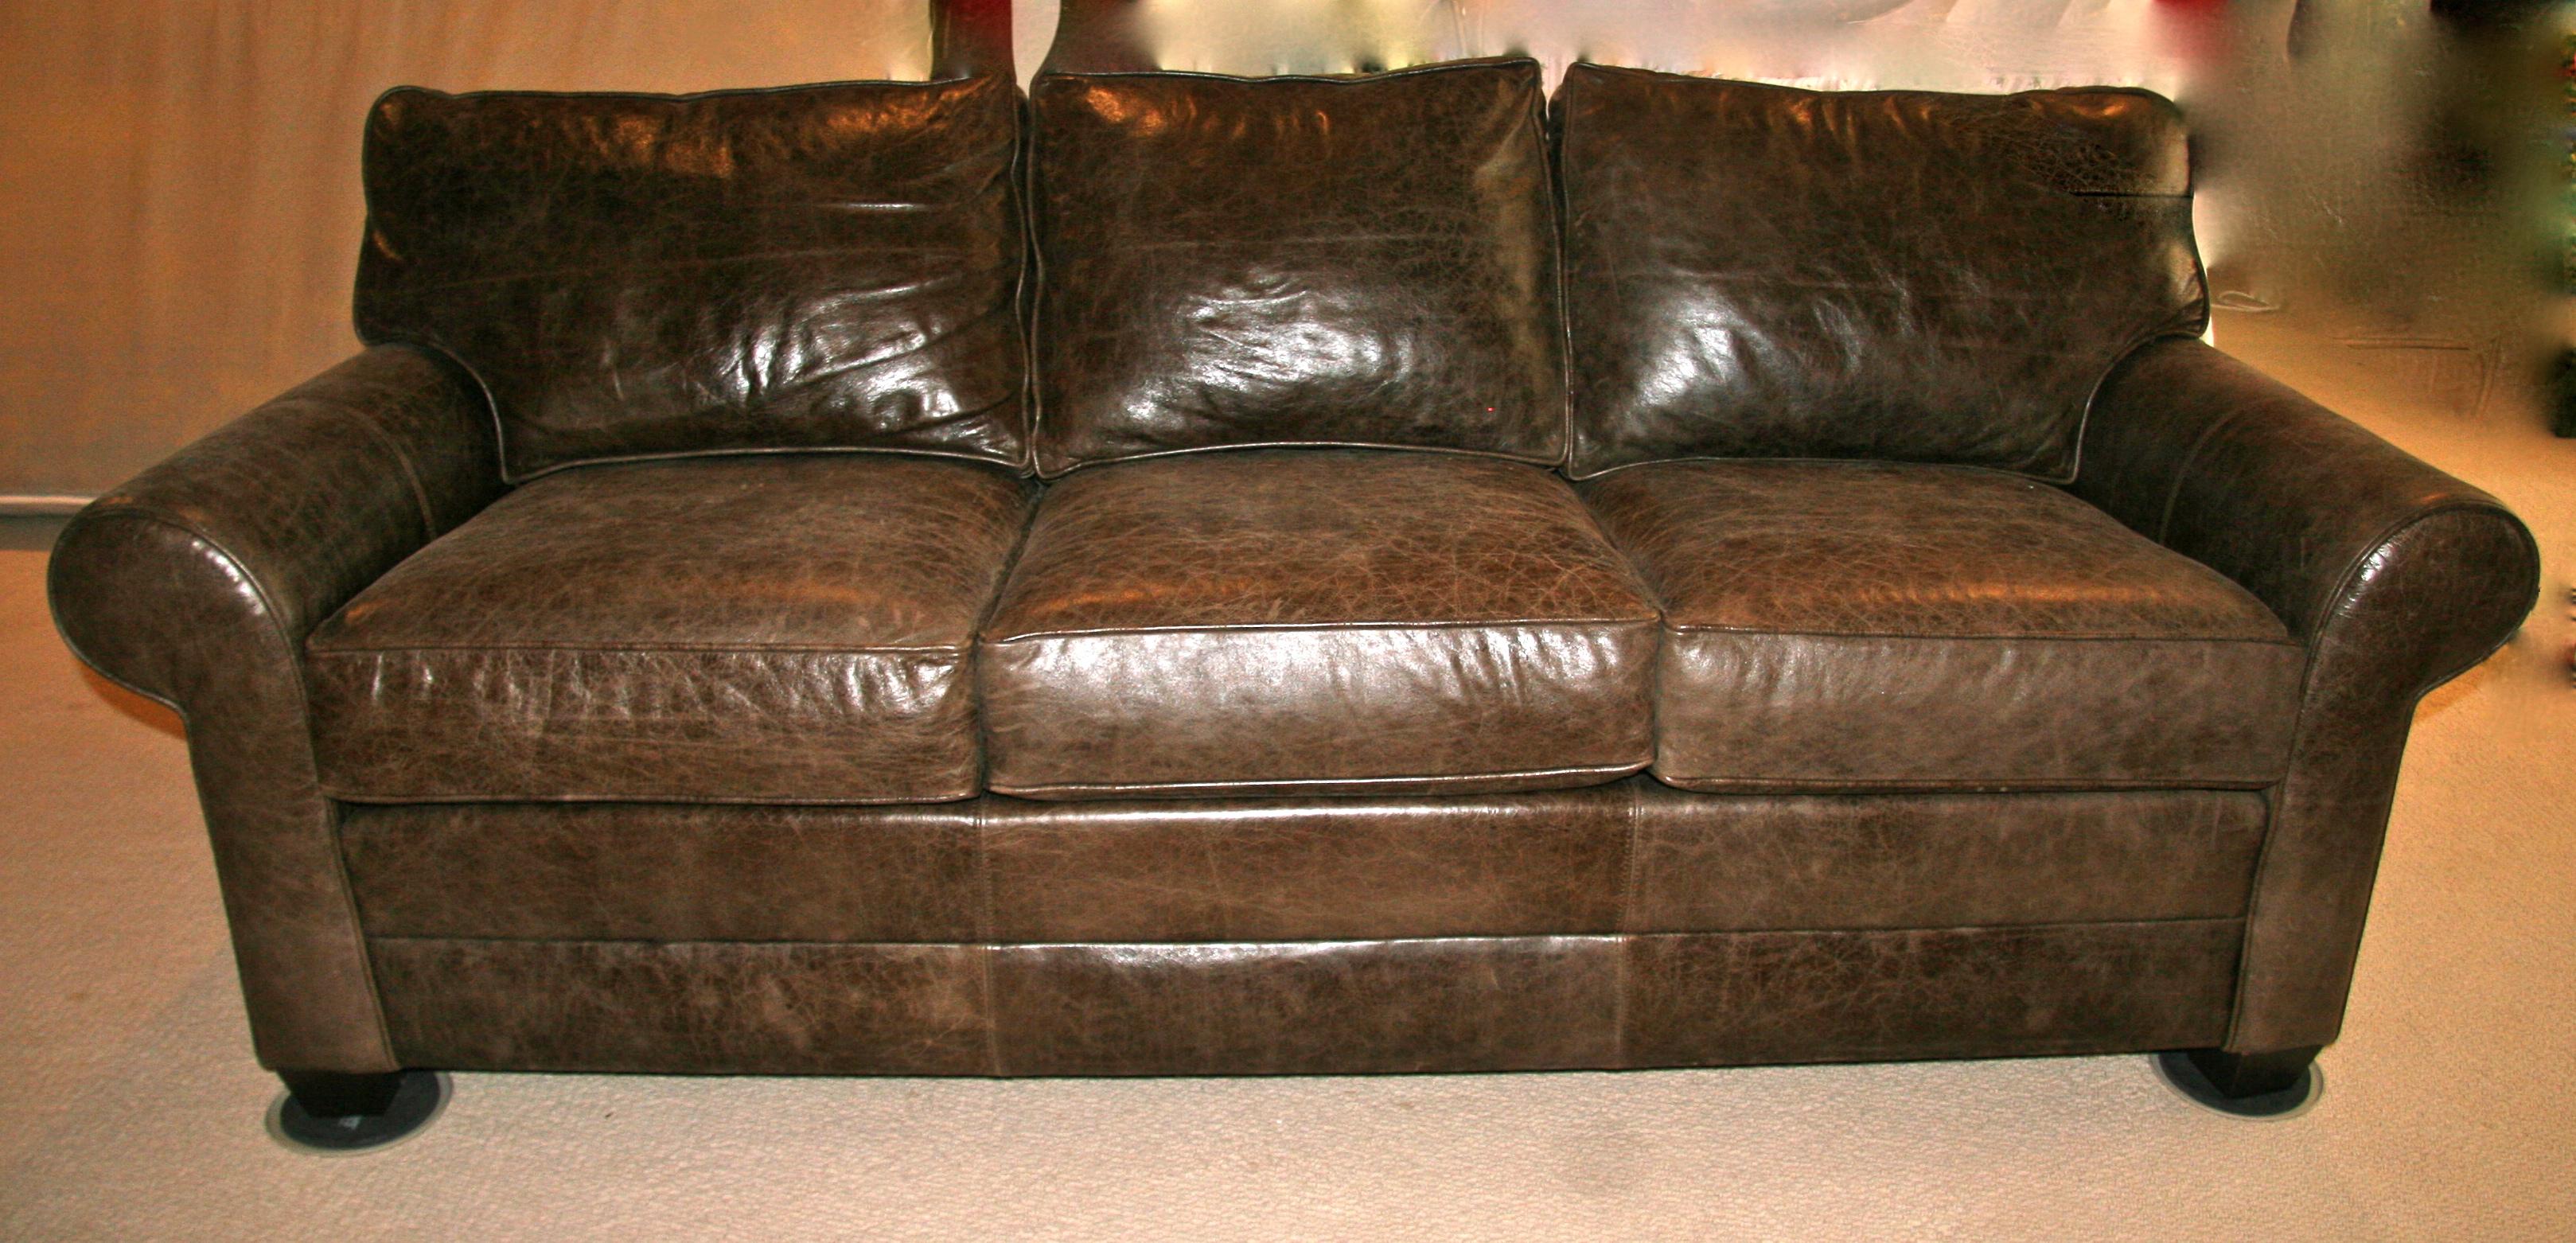 ethan allen leather chair neutral posture xsm brown sofa goodstuffcheapstl s blog